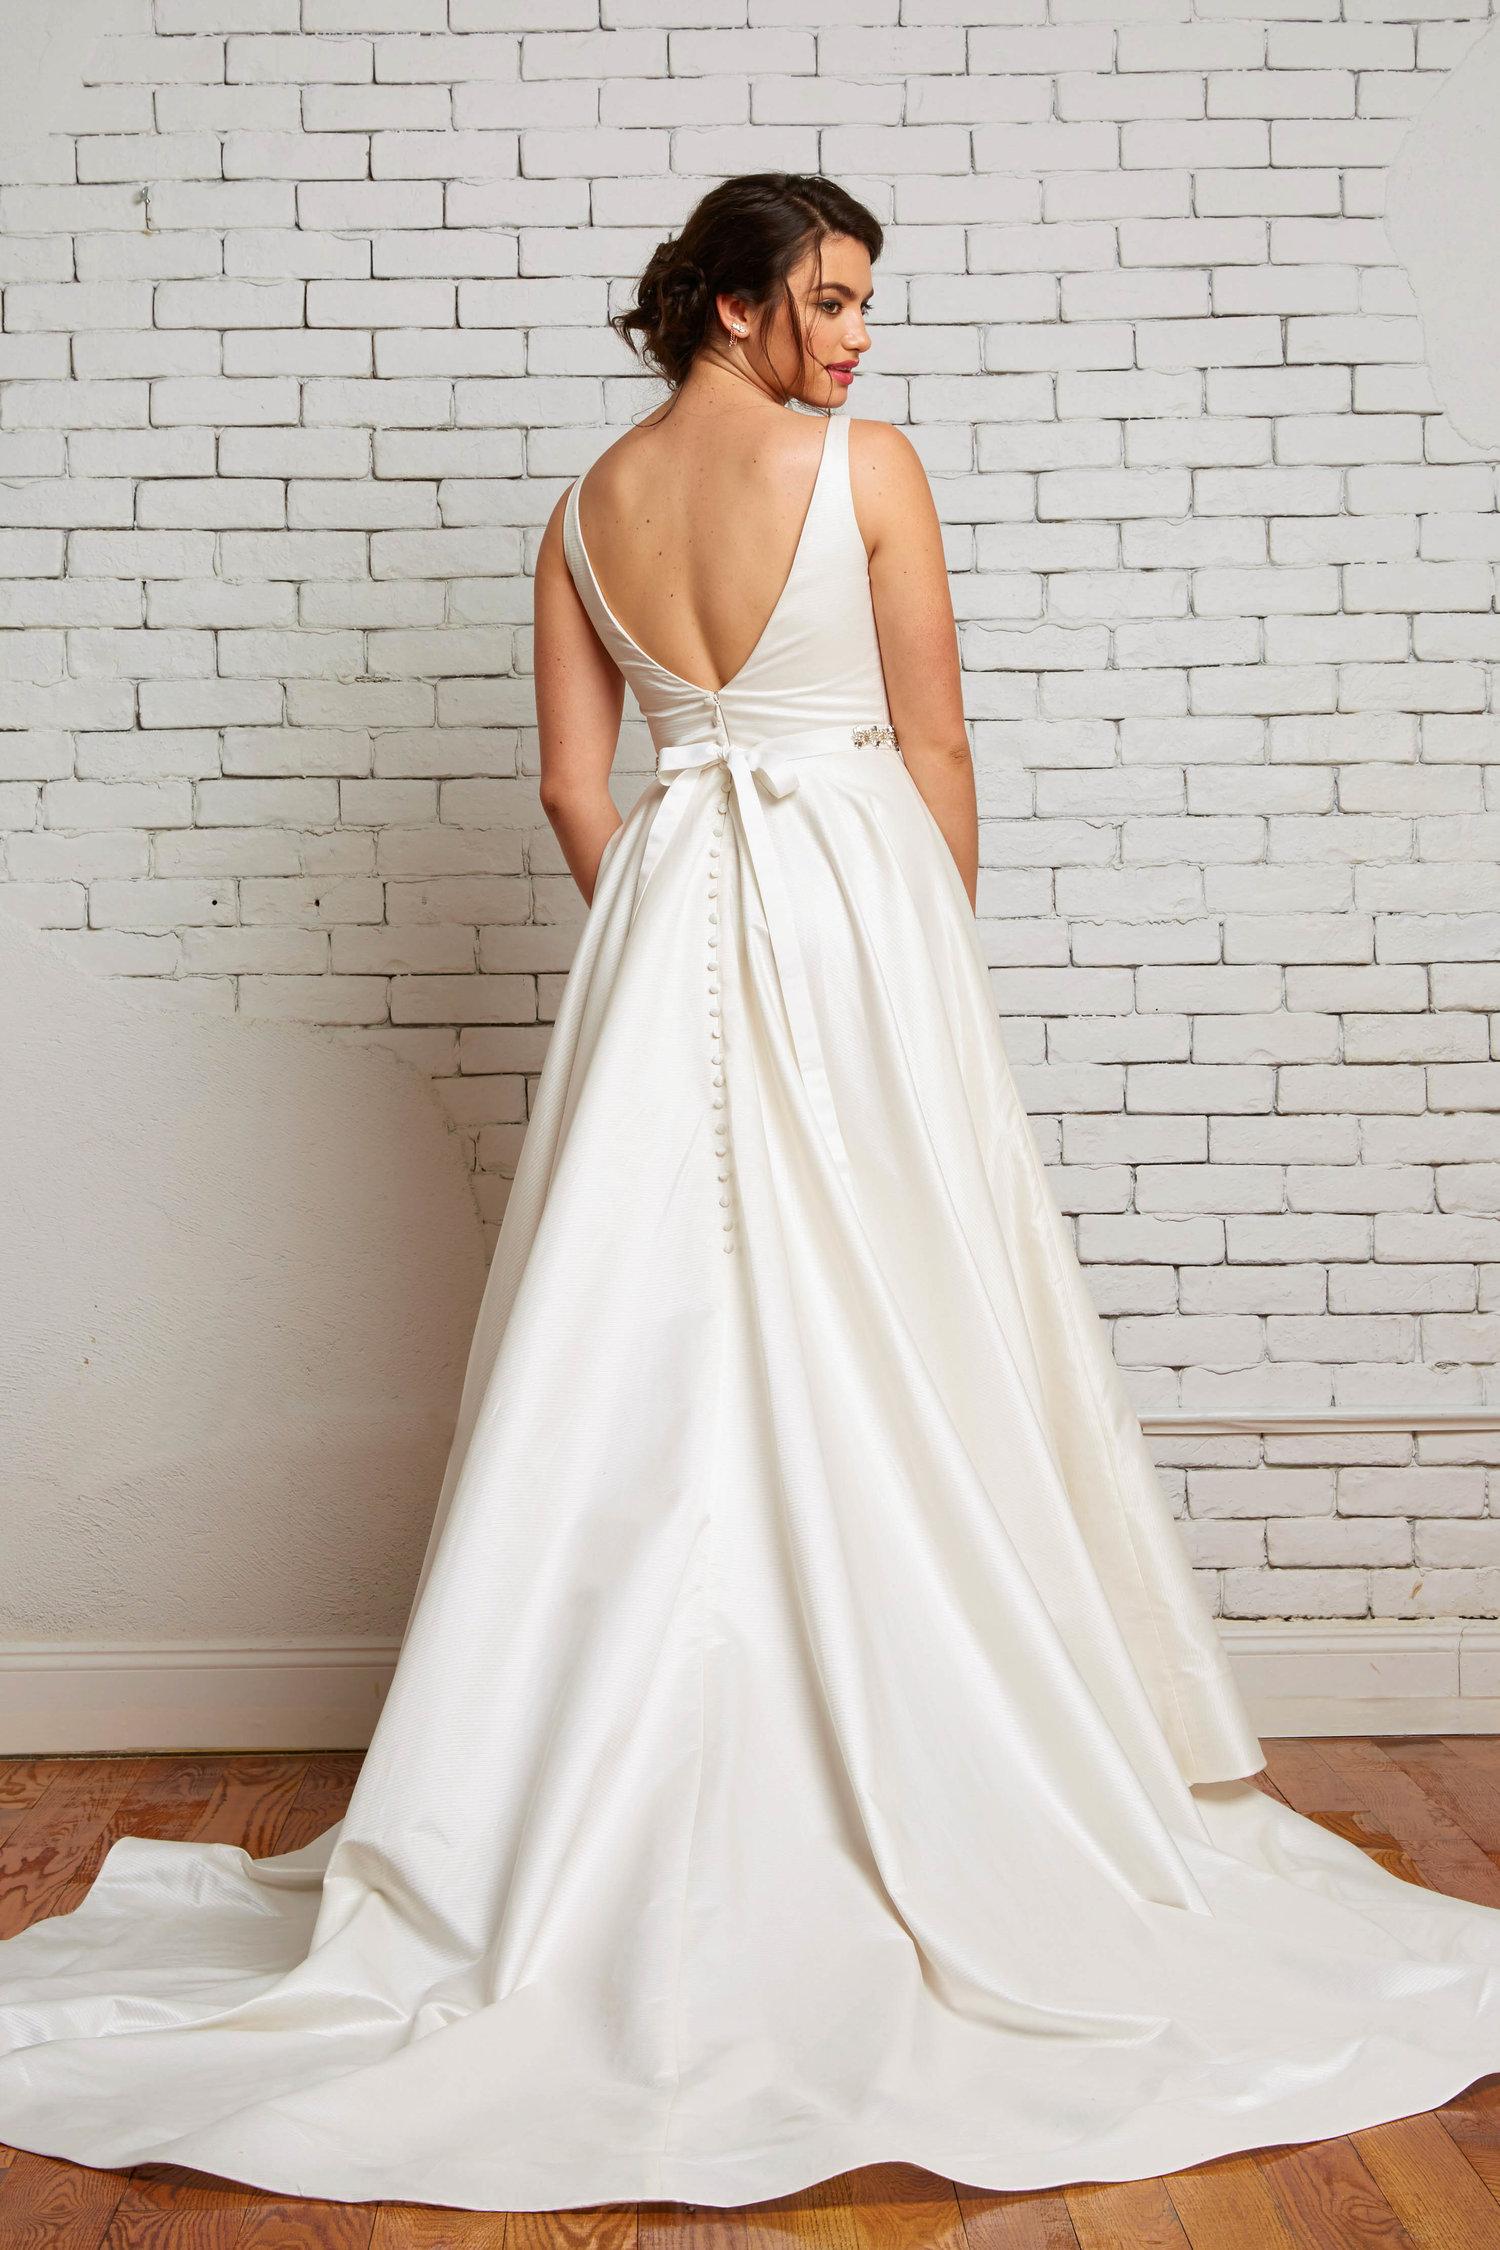 ivory-and-beau-bridal-boutique-zodiac-wedding-style-savannah-wedding-gowns-savannah-wedding-dresses-earnest-loans-18.jpg